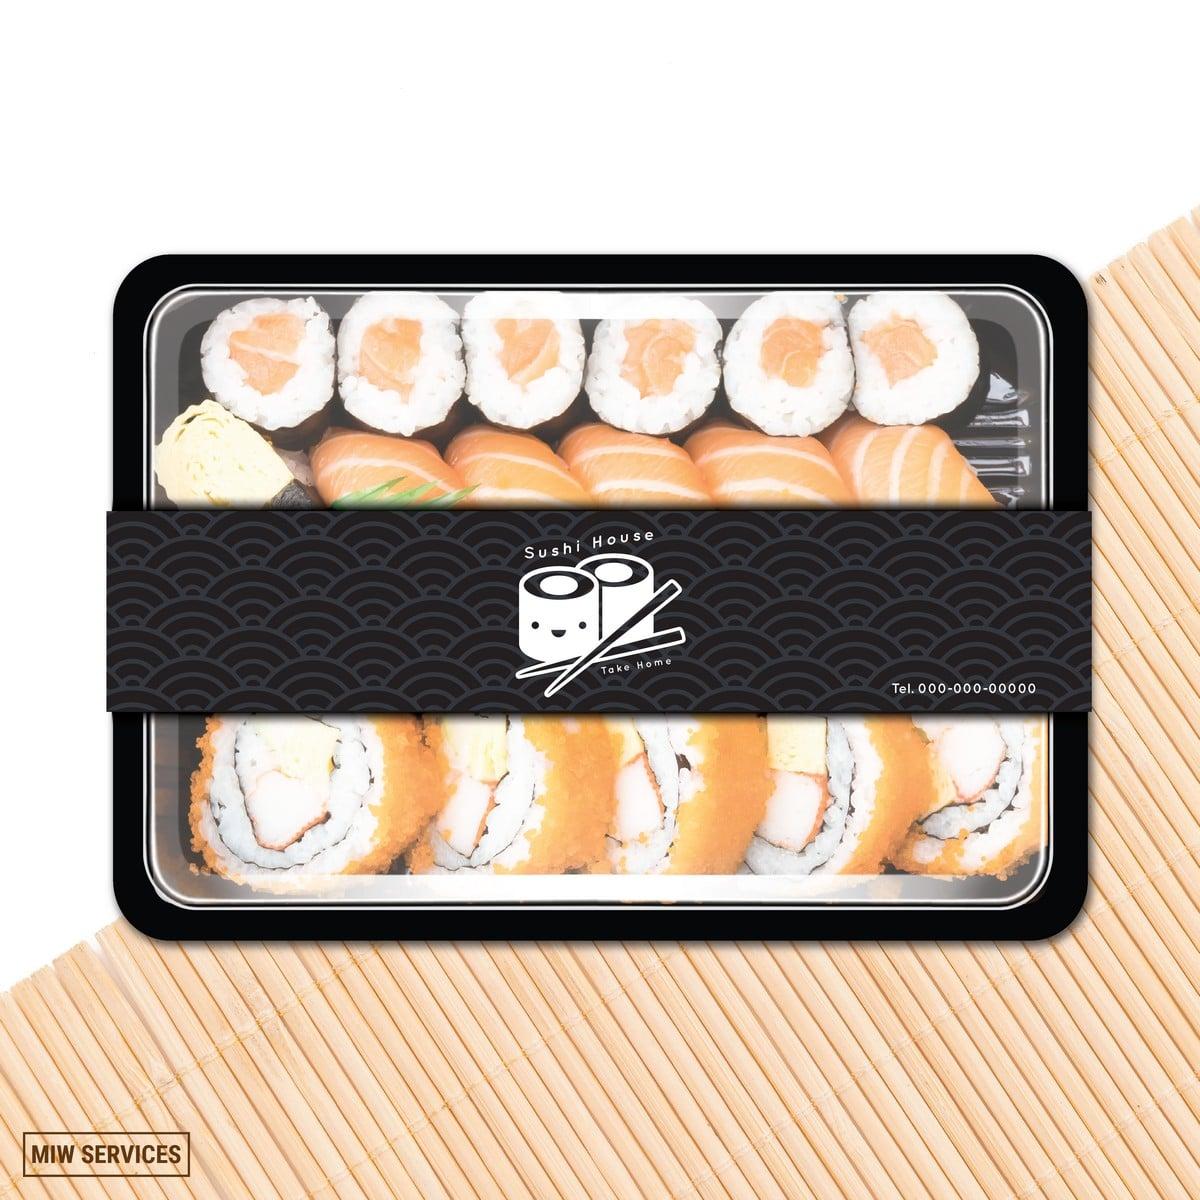 Food Box 02 0 - บริการ พิมพ์สายคาดกล่องอาหาร กล่องขนม สำหรับ Food Delivery